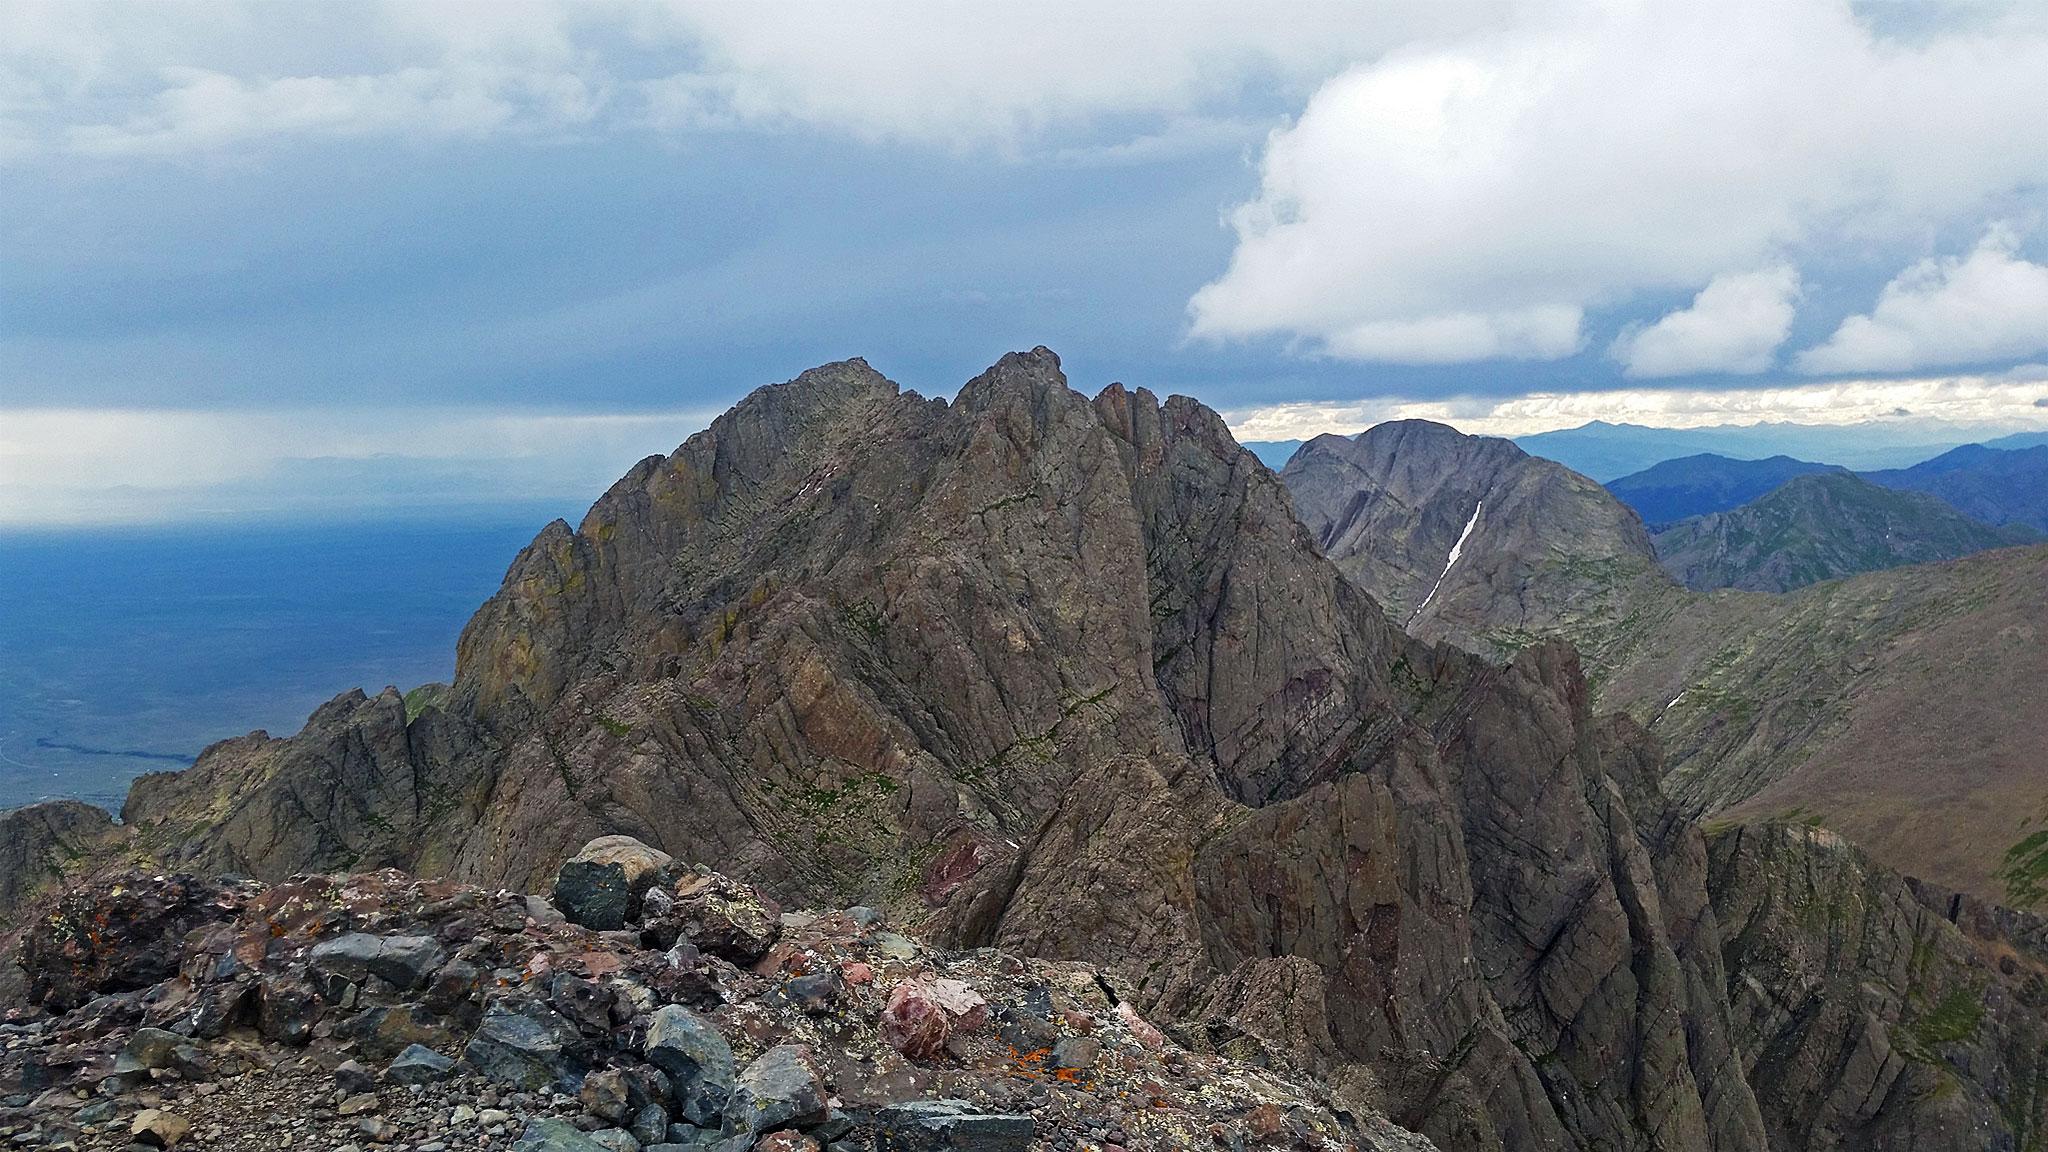 Crestone Peak from Crestone Needle